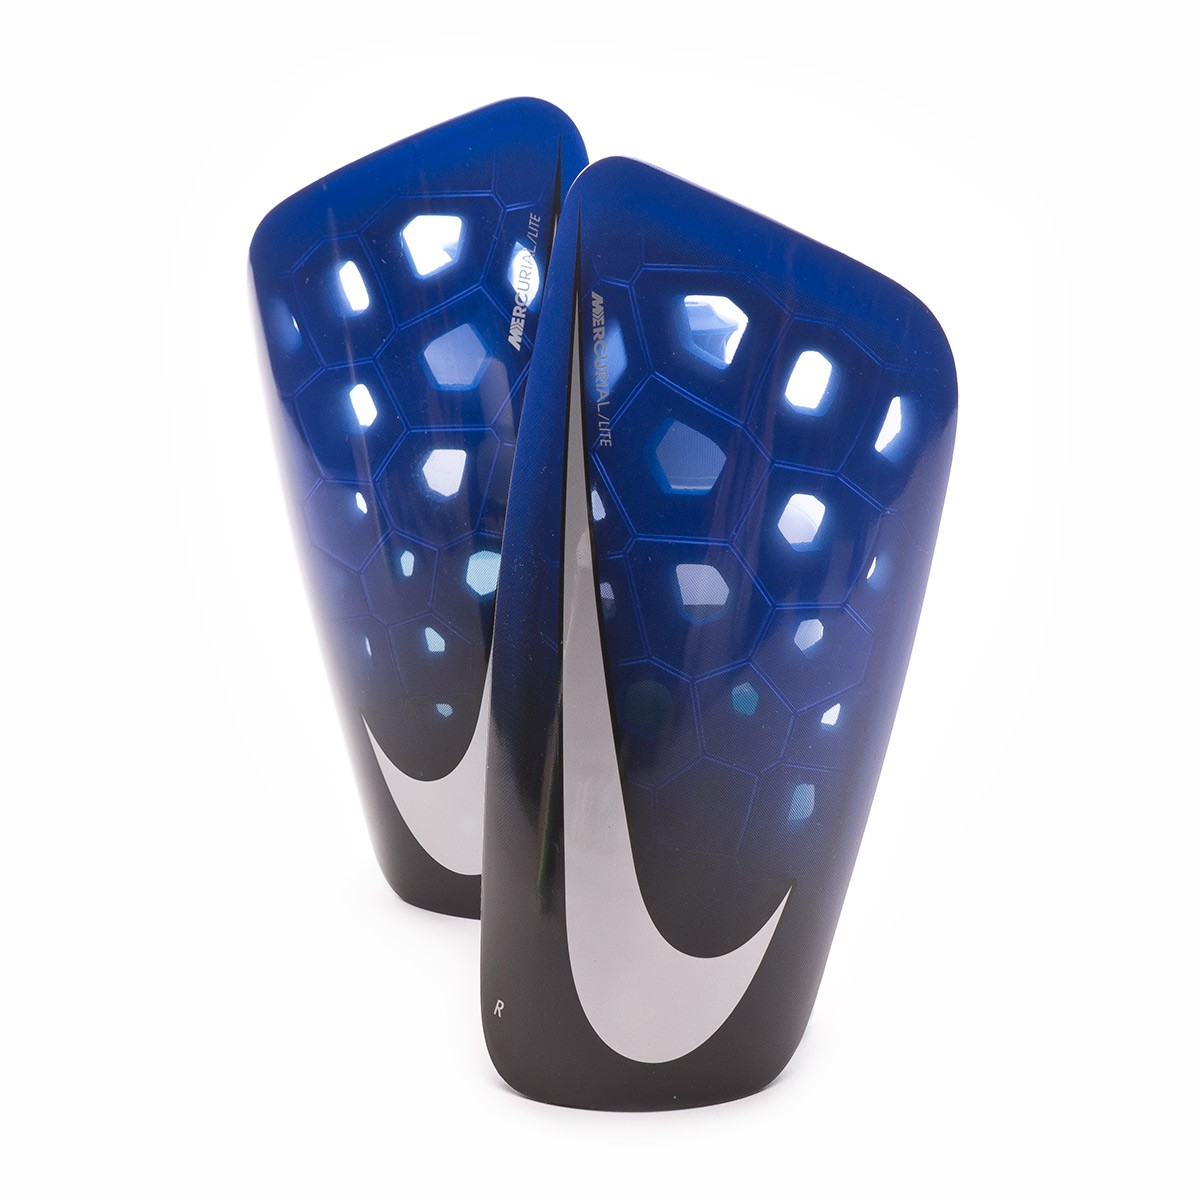 good service exclusive deals best deals on Nike Mercurial Lite Shinpads